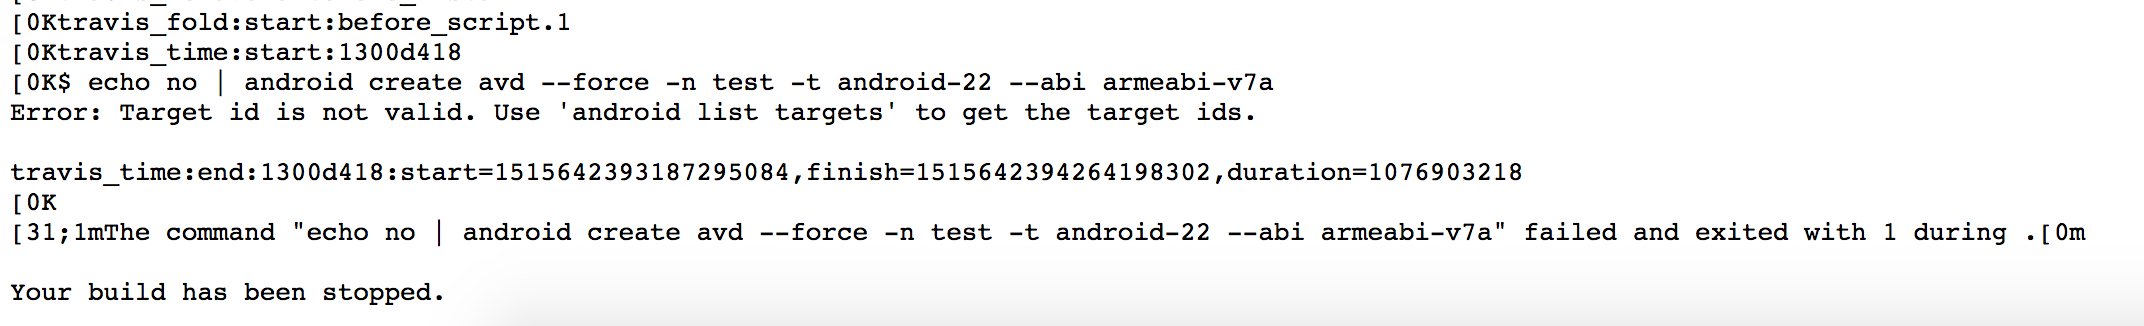 未添加模拟器andorid版本报错信息